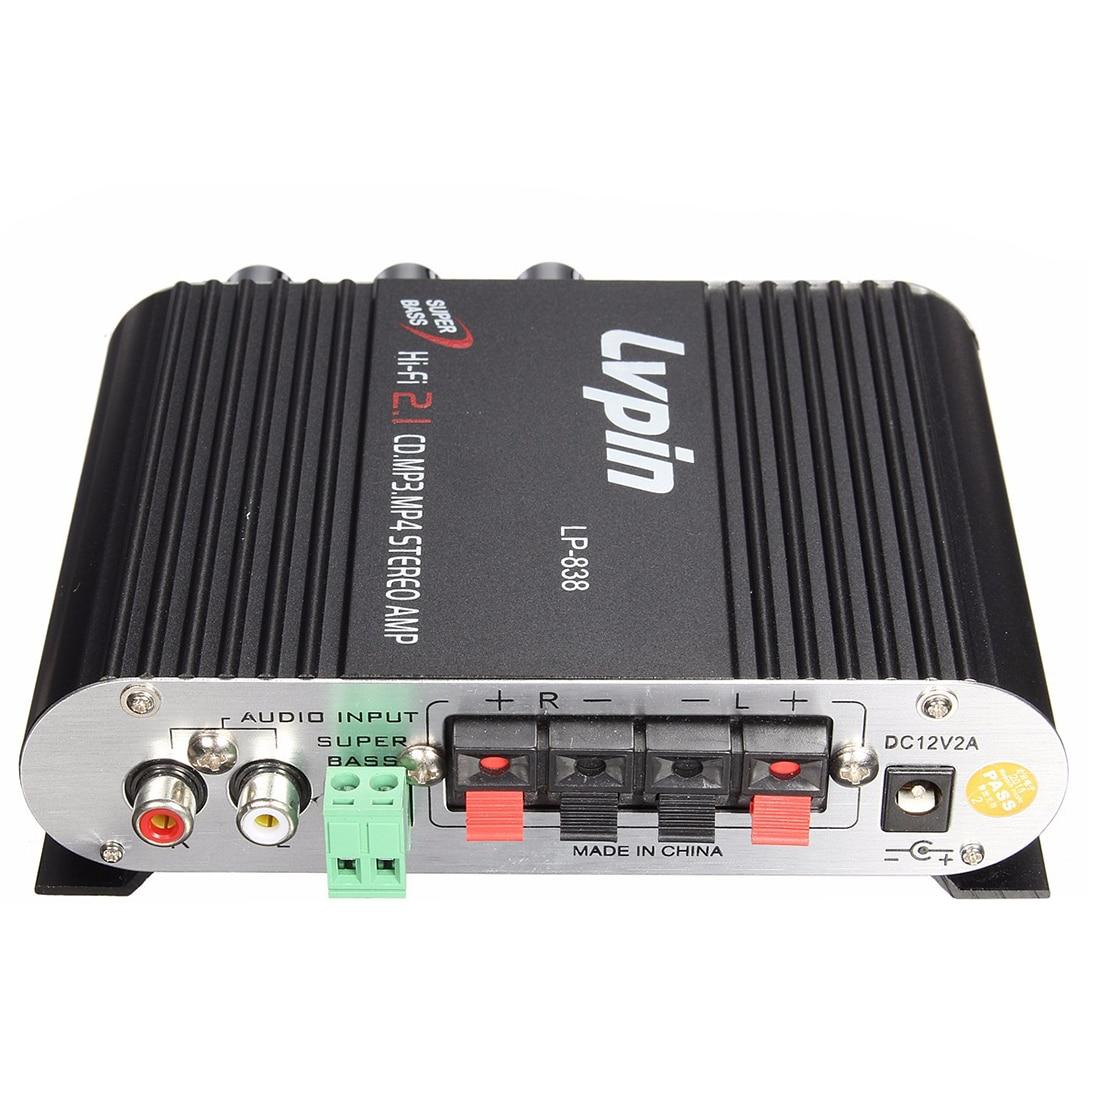 LVPIN 12V 200W Mini Hi-Fi Stereo Amplifier MP3 Car Radio Channels 2 House Super Bass